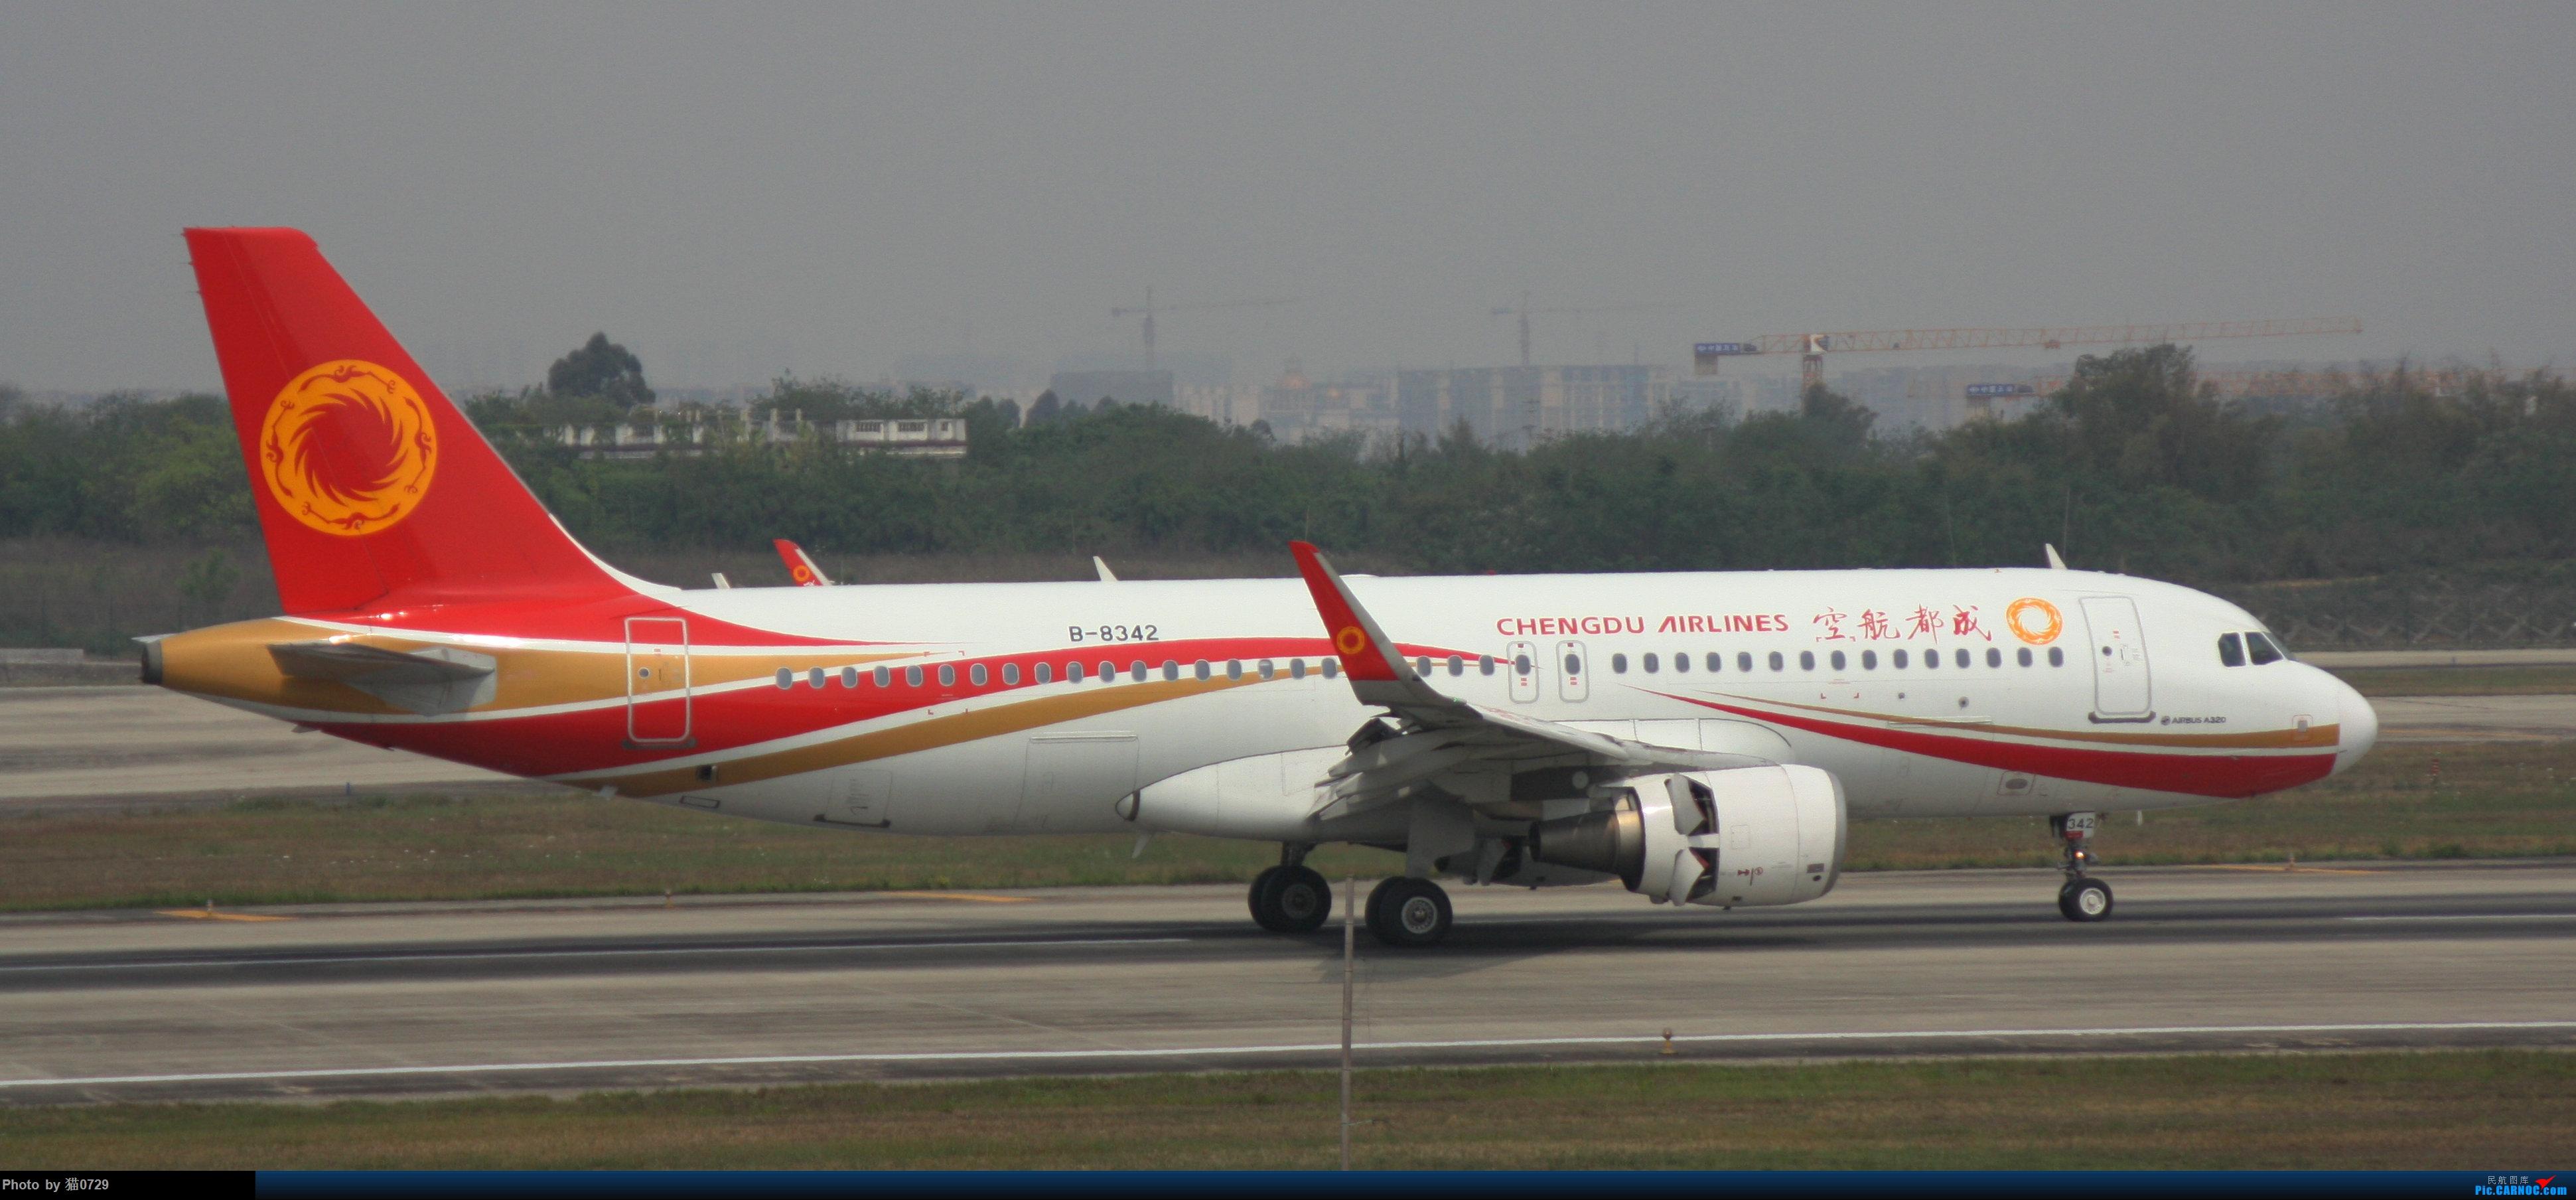 Re:[原创]CTU 119.425 水泥 伊朗346 巴基斯坦777 AIRBUS A320-200 B-8342 中国成都双流国际机场